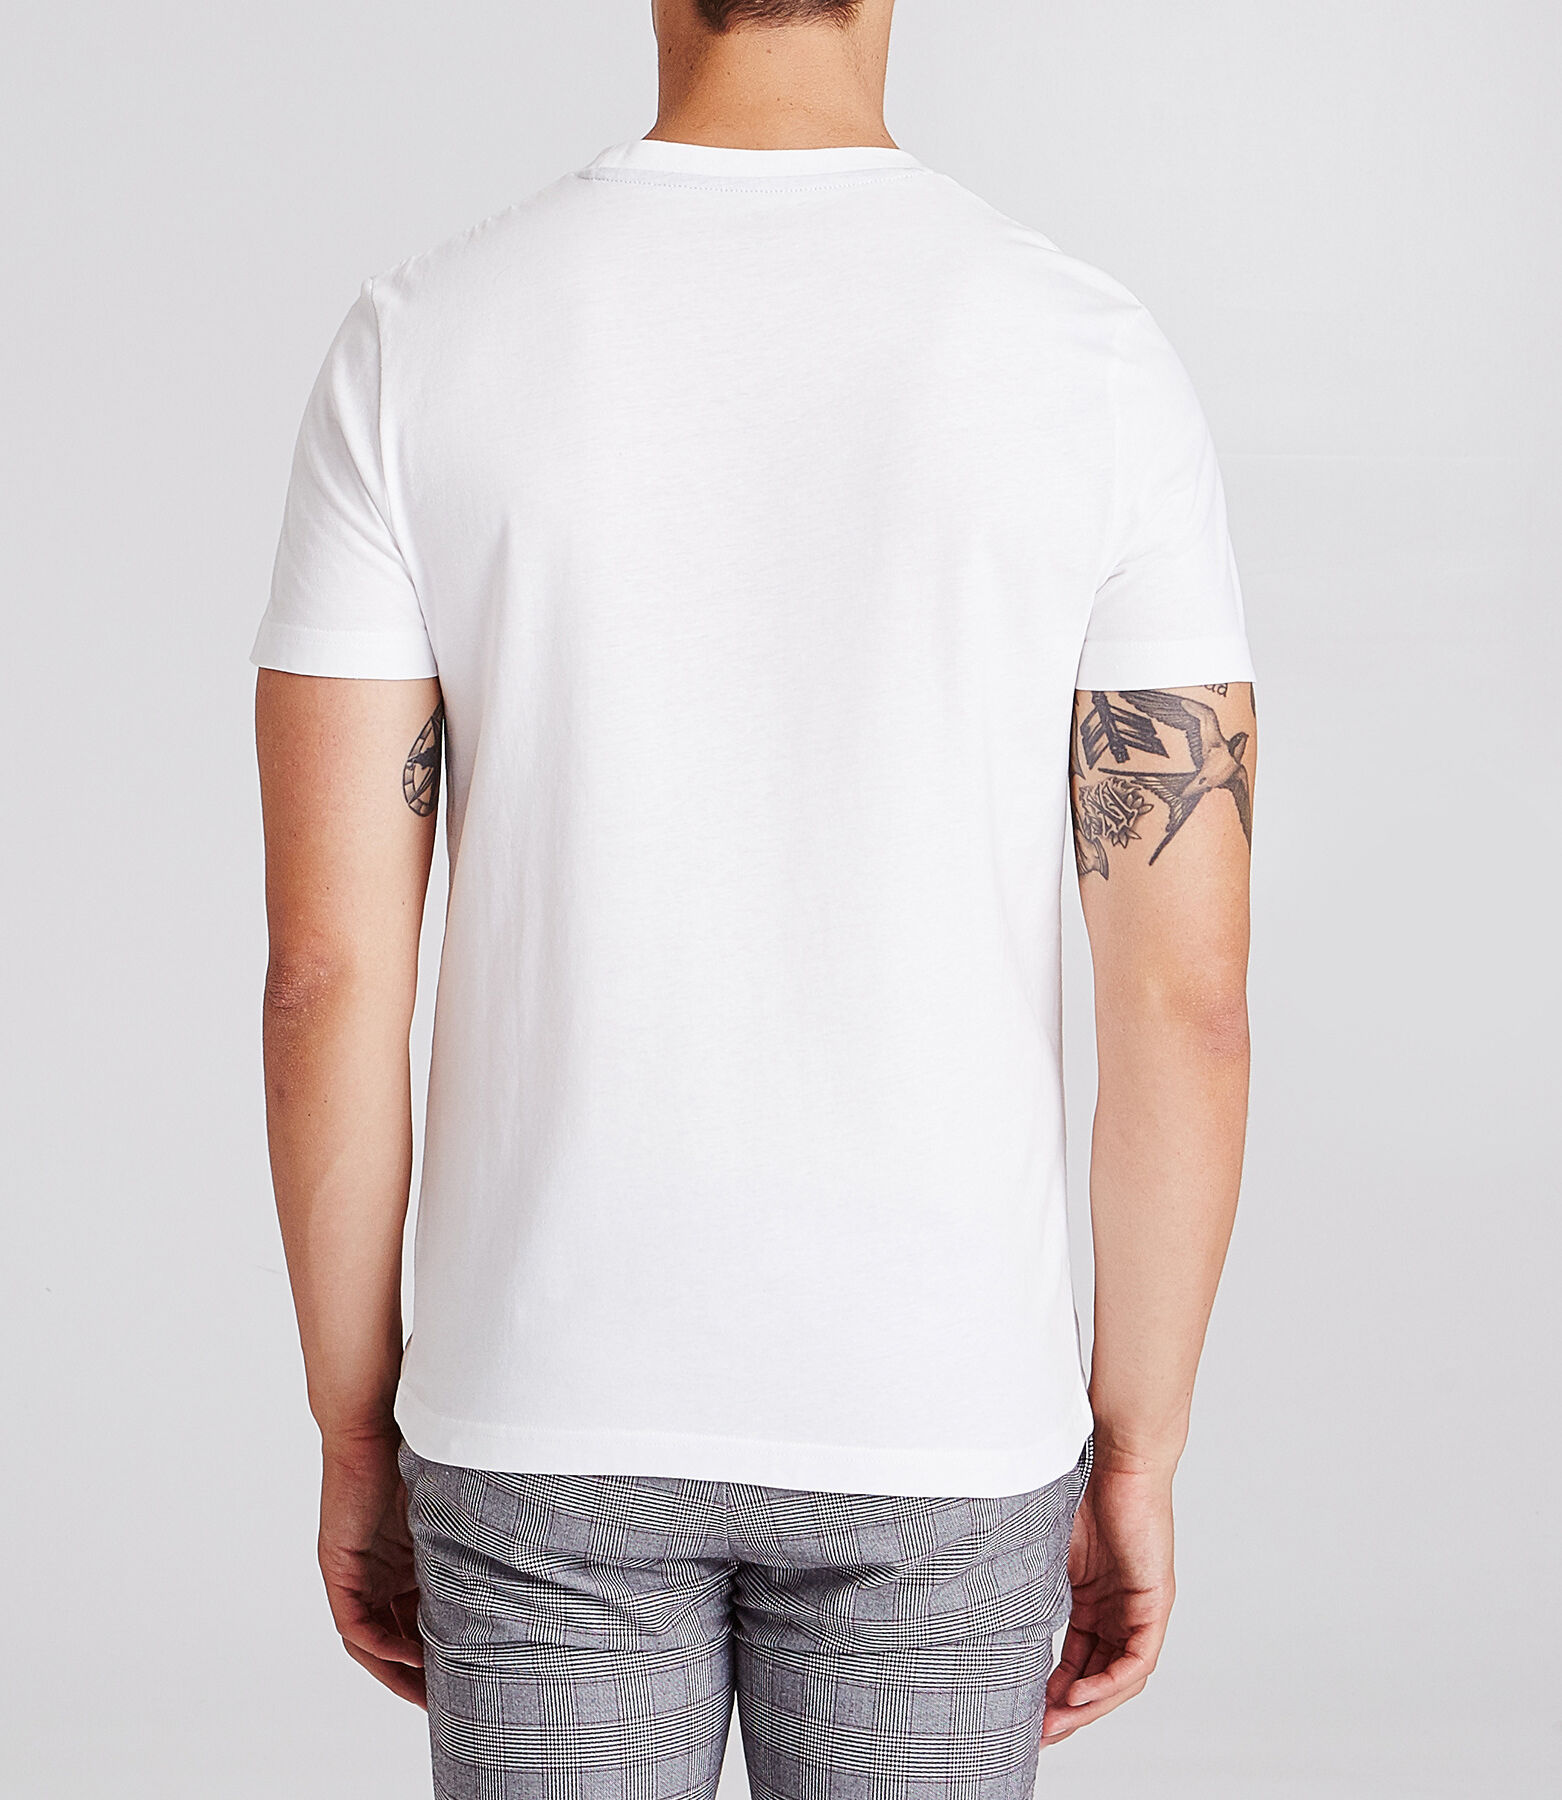 T-shirt met print van regio Auvergne